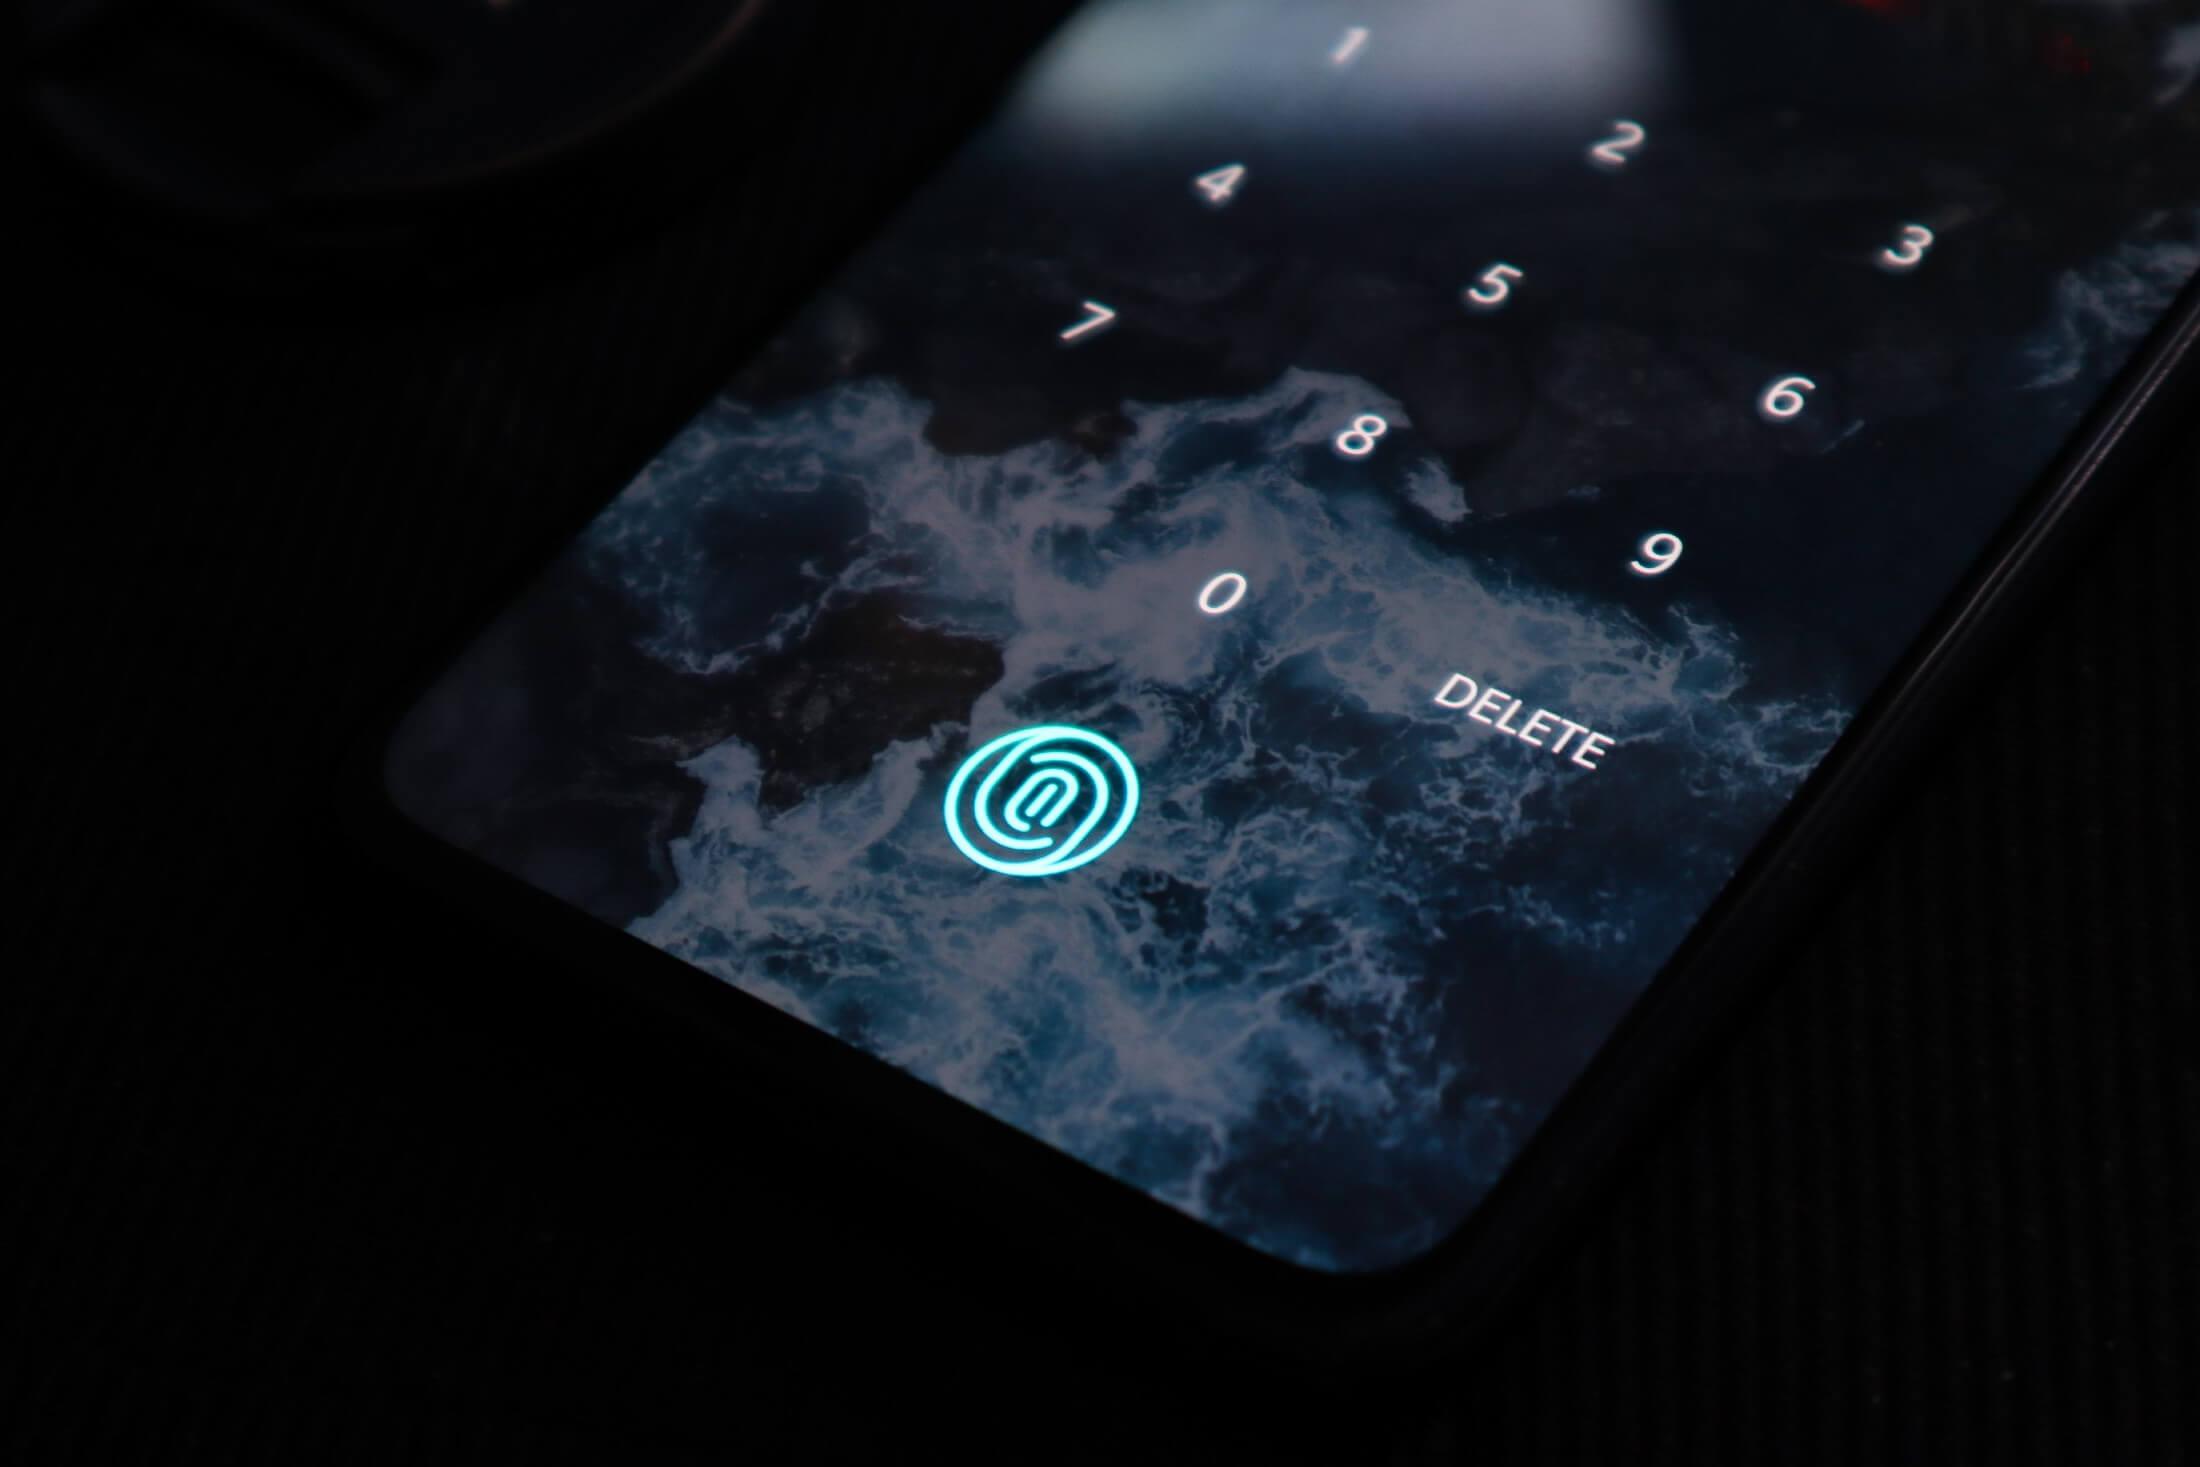 сканер отпечатков пальцев на смартфоне в экране